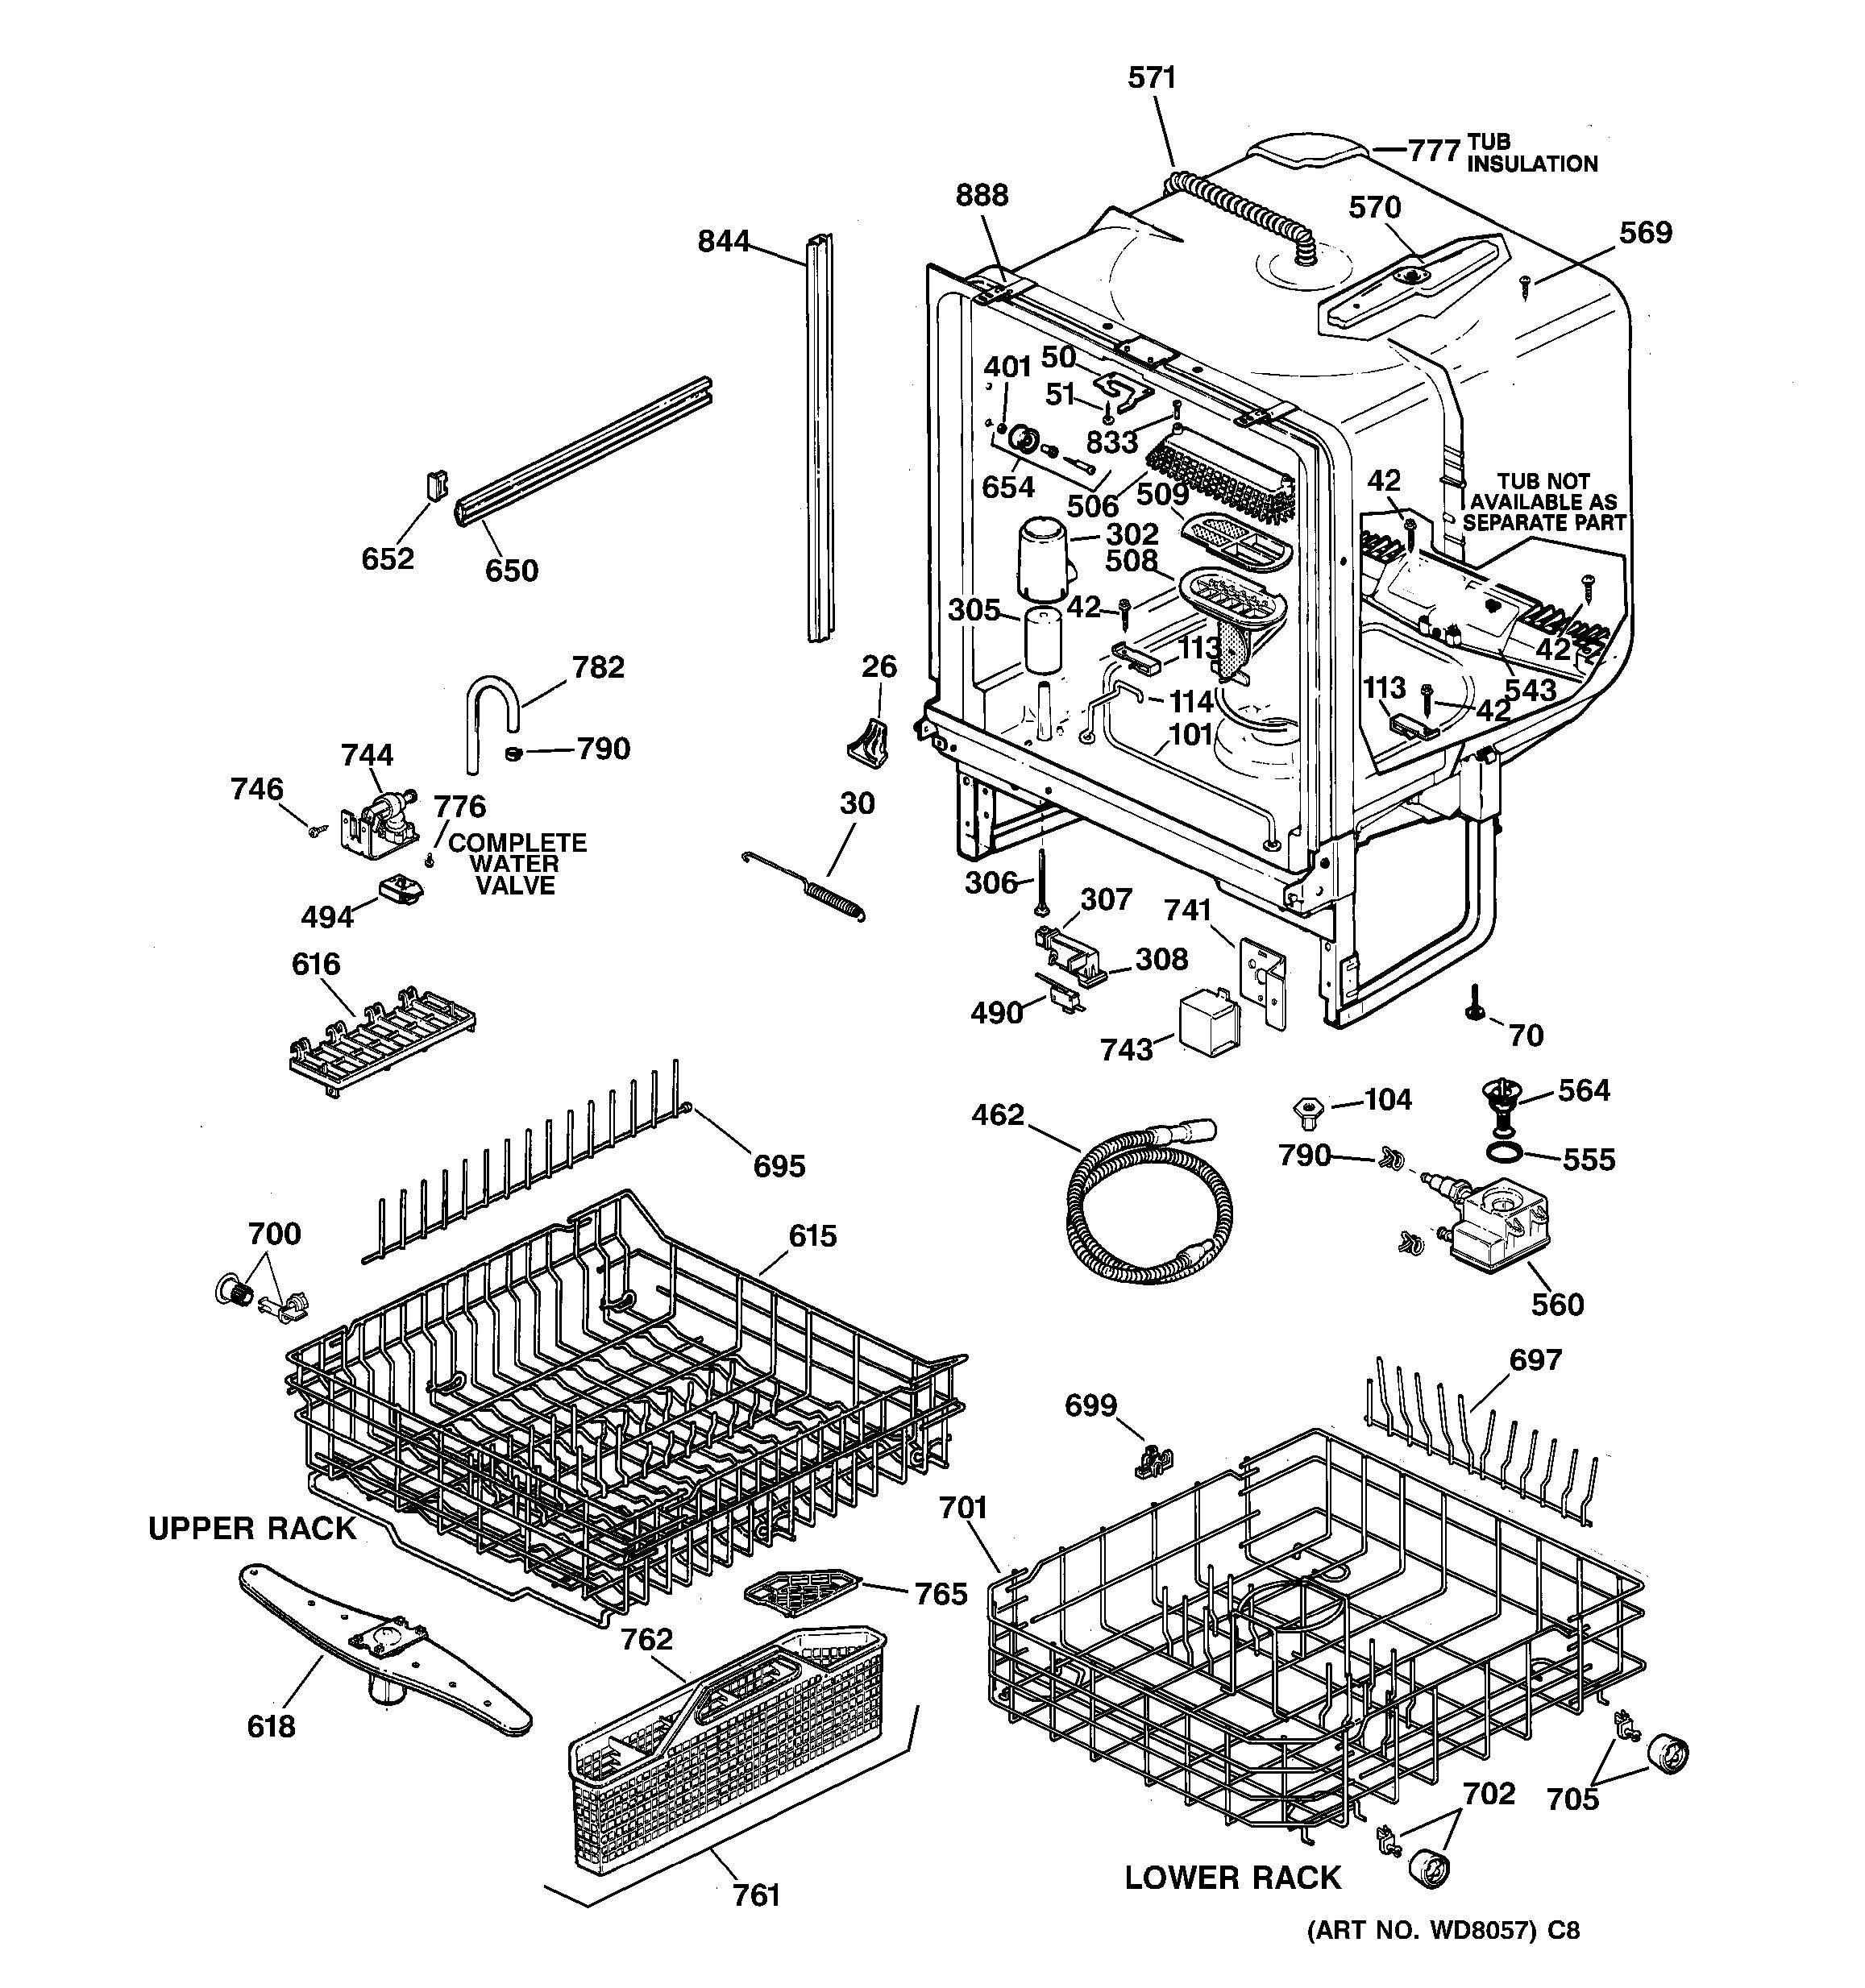 ge dishwasher parts diagram fiesta mk4 radio wiring model search gsd5310d02aa